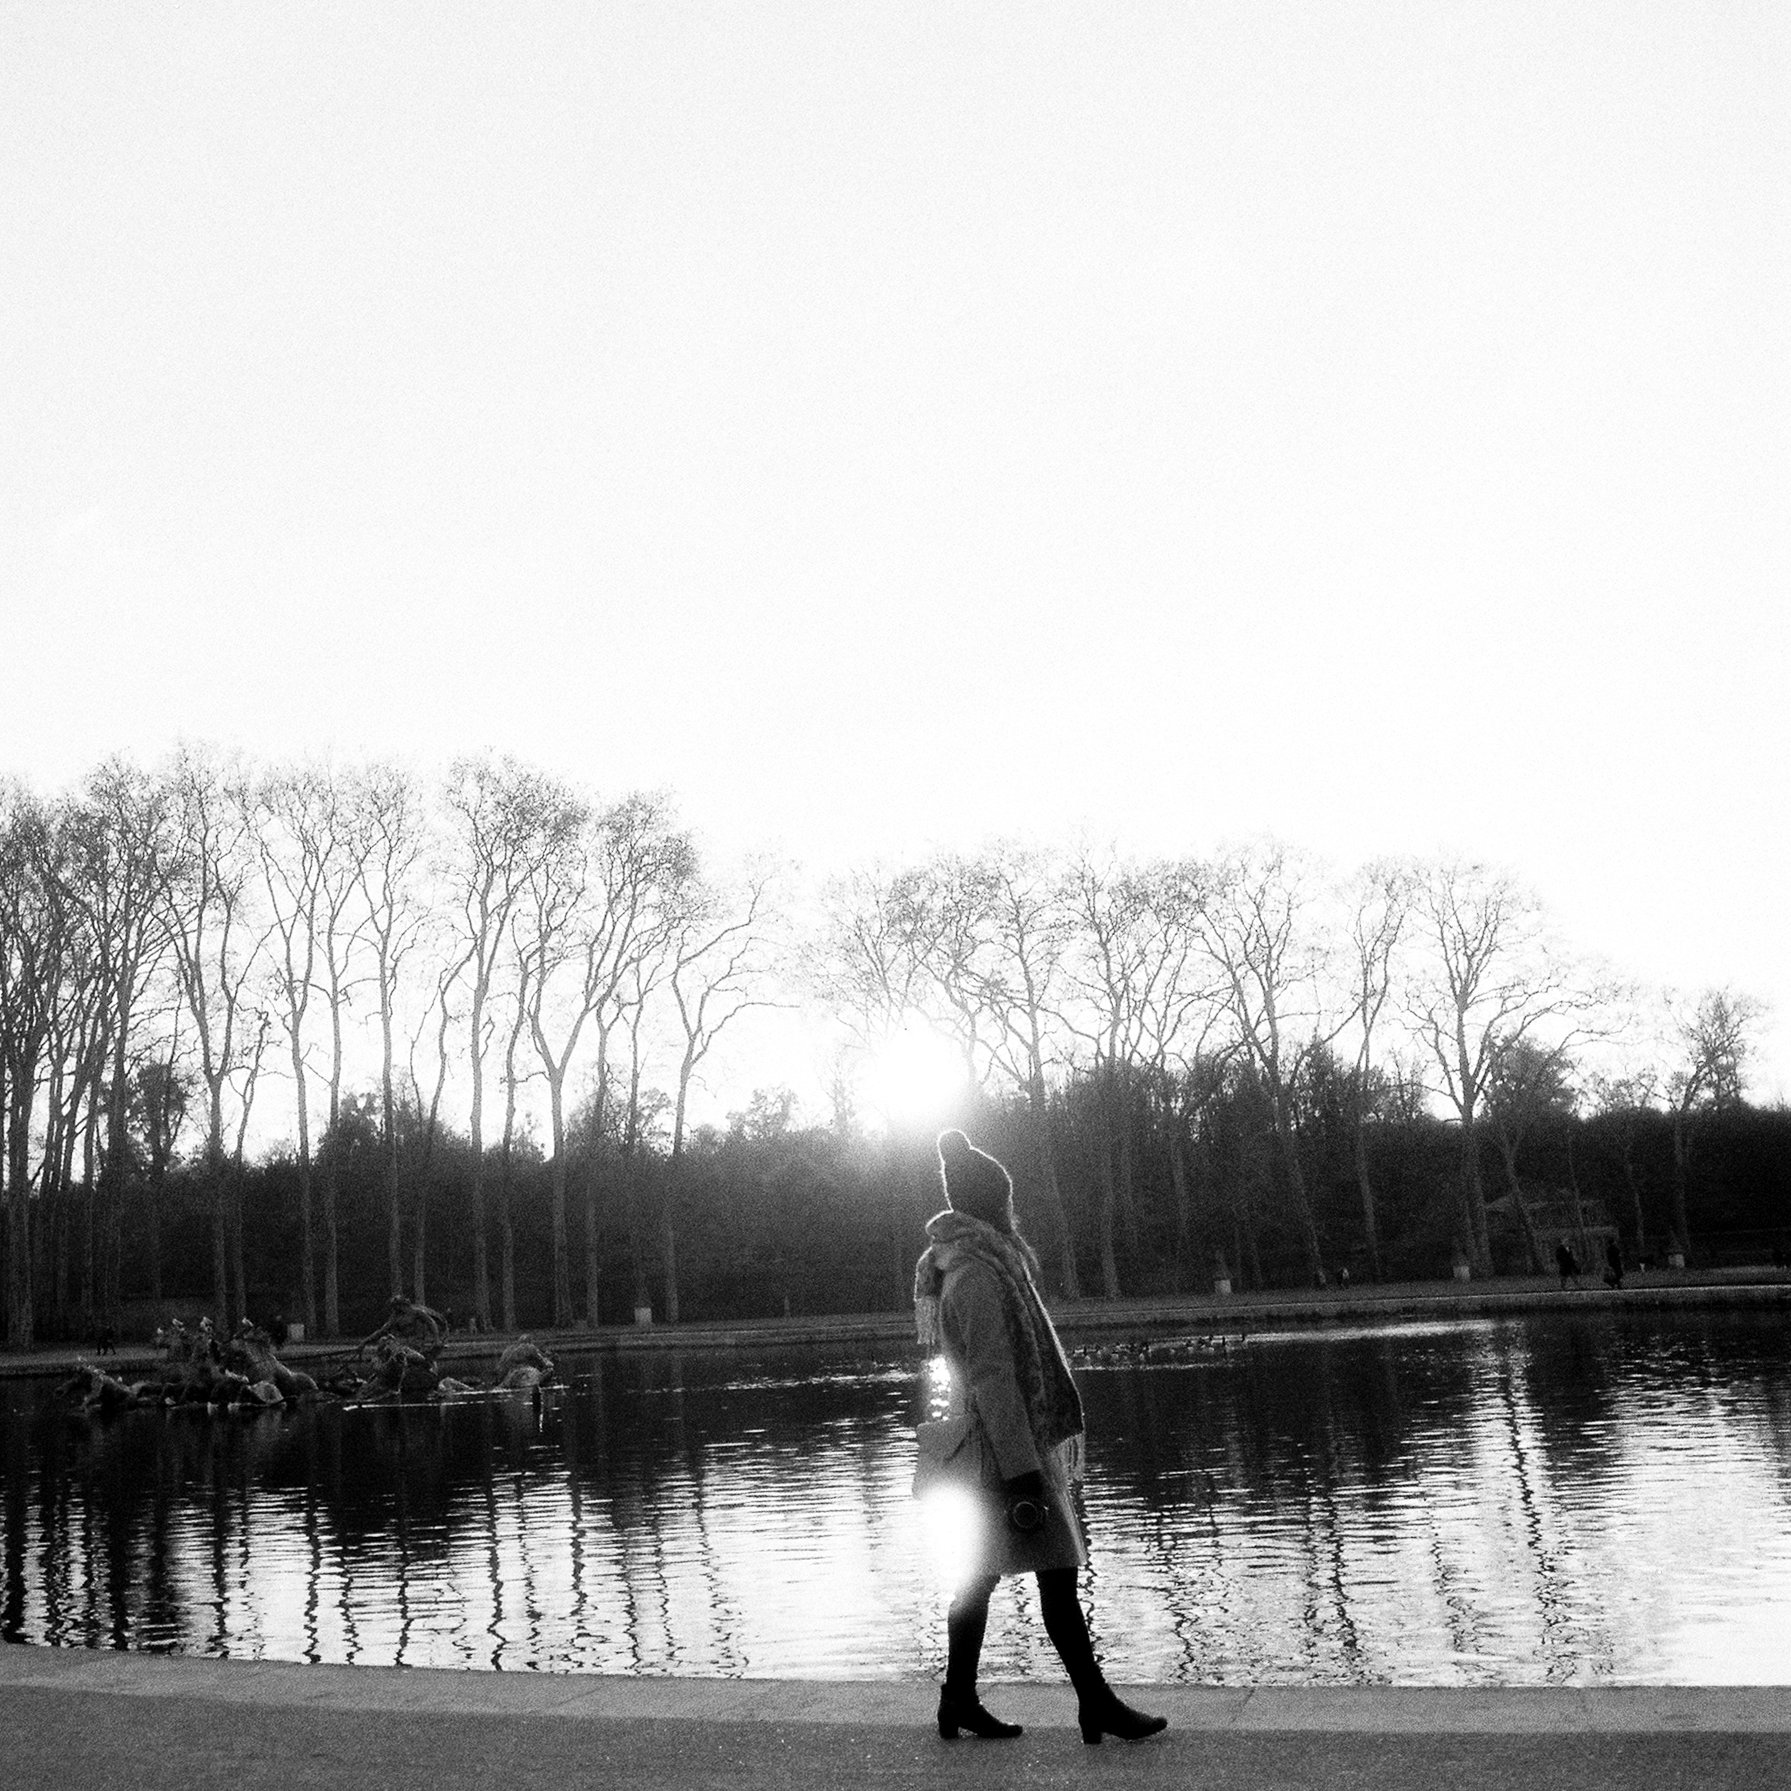 Paris Hasselblad B&W-0019.jpg